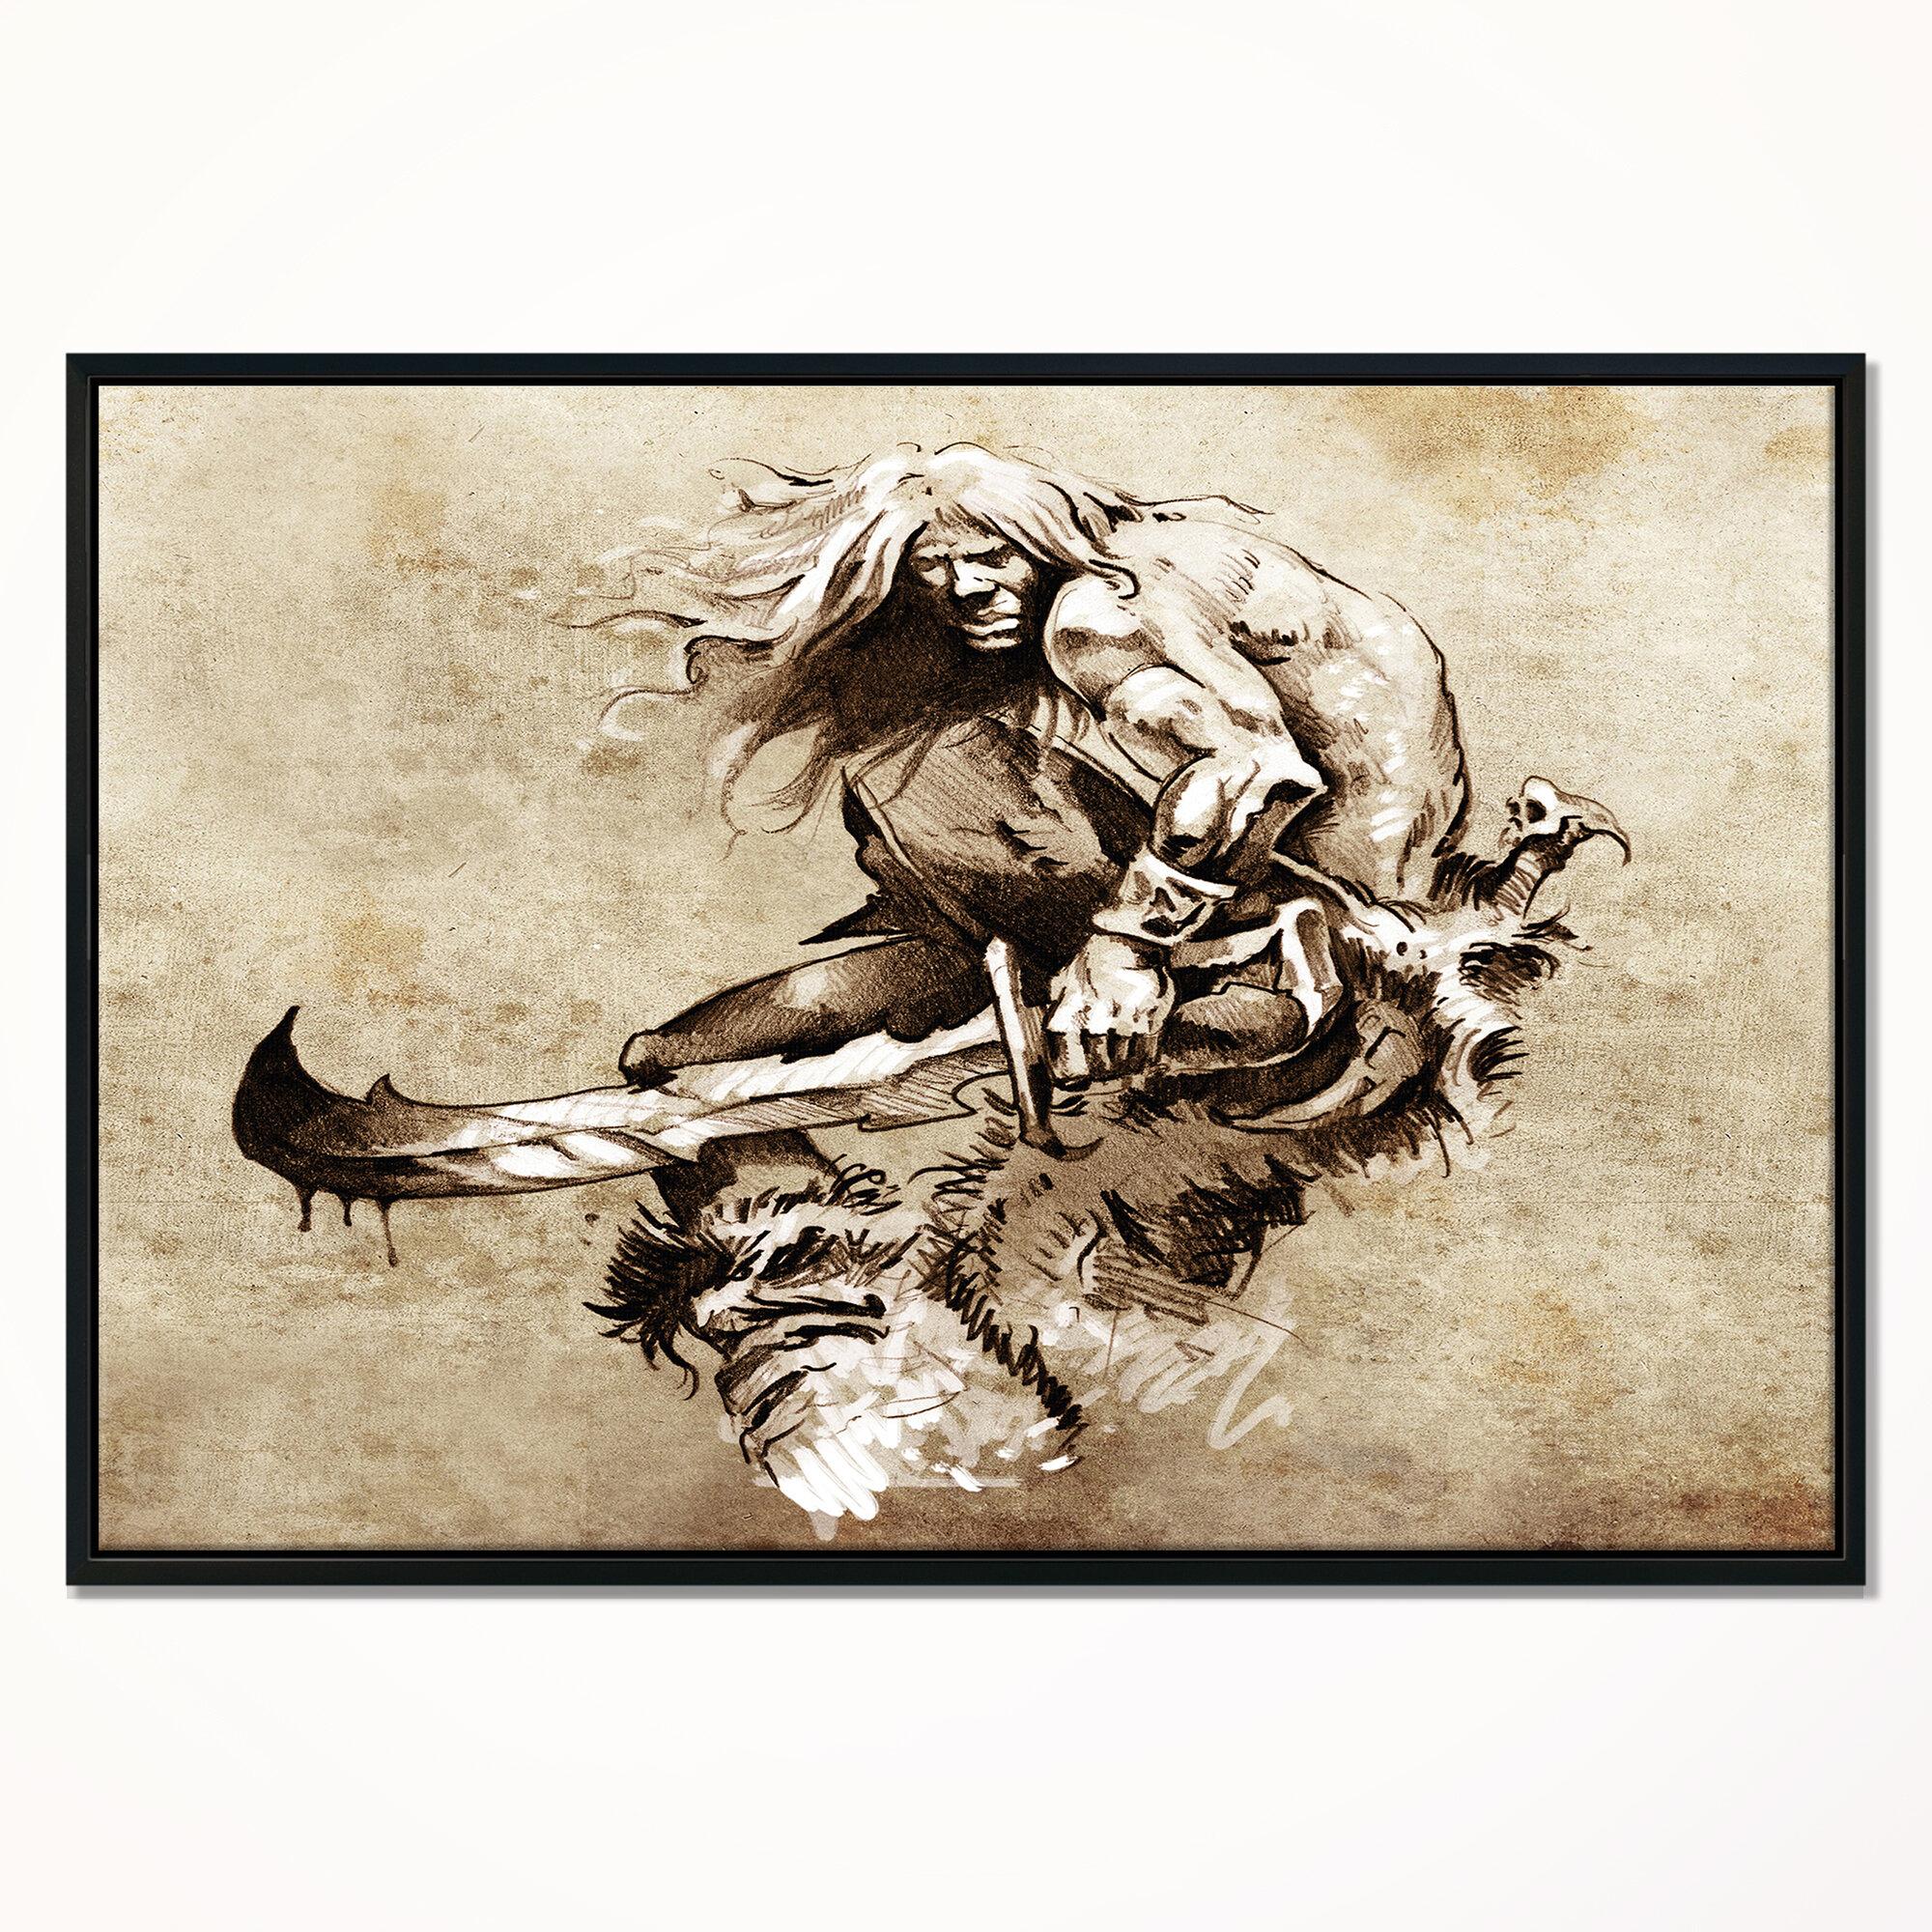 East Urban Home Warrior Fighting Tattoo Art Framed Print On Wrapped Canvas Wayfair